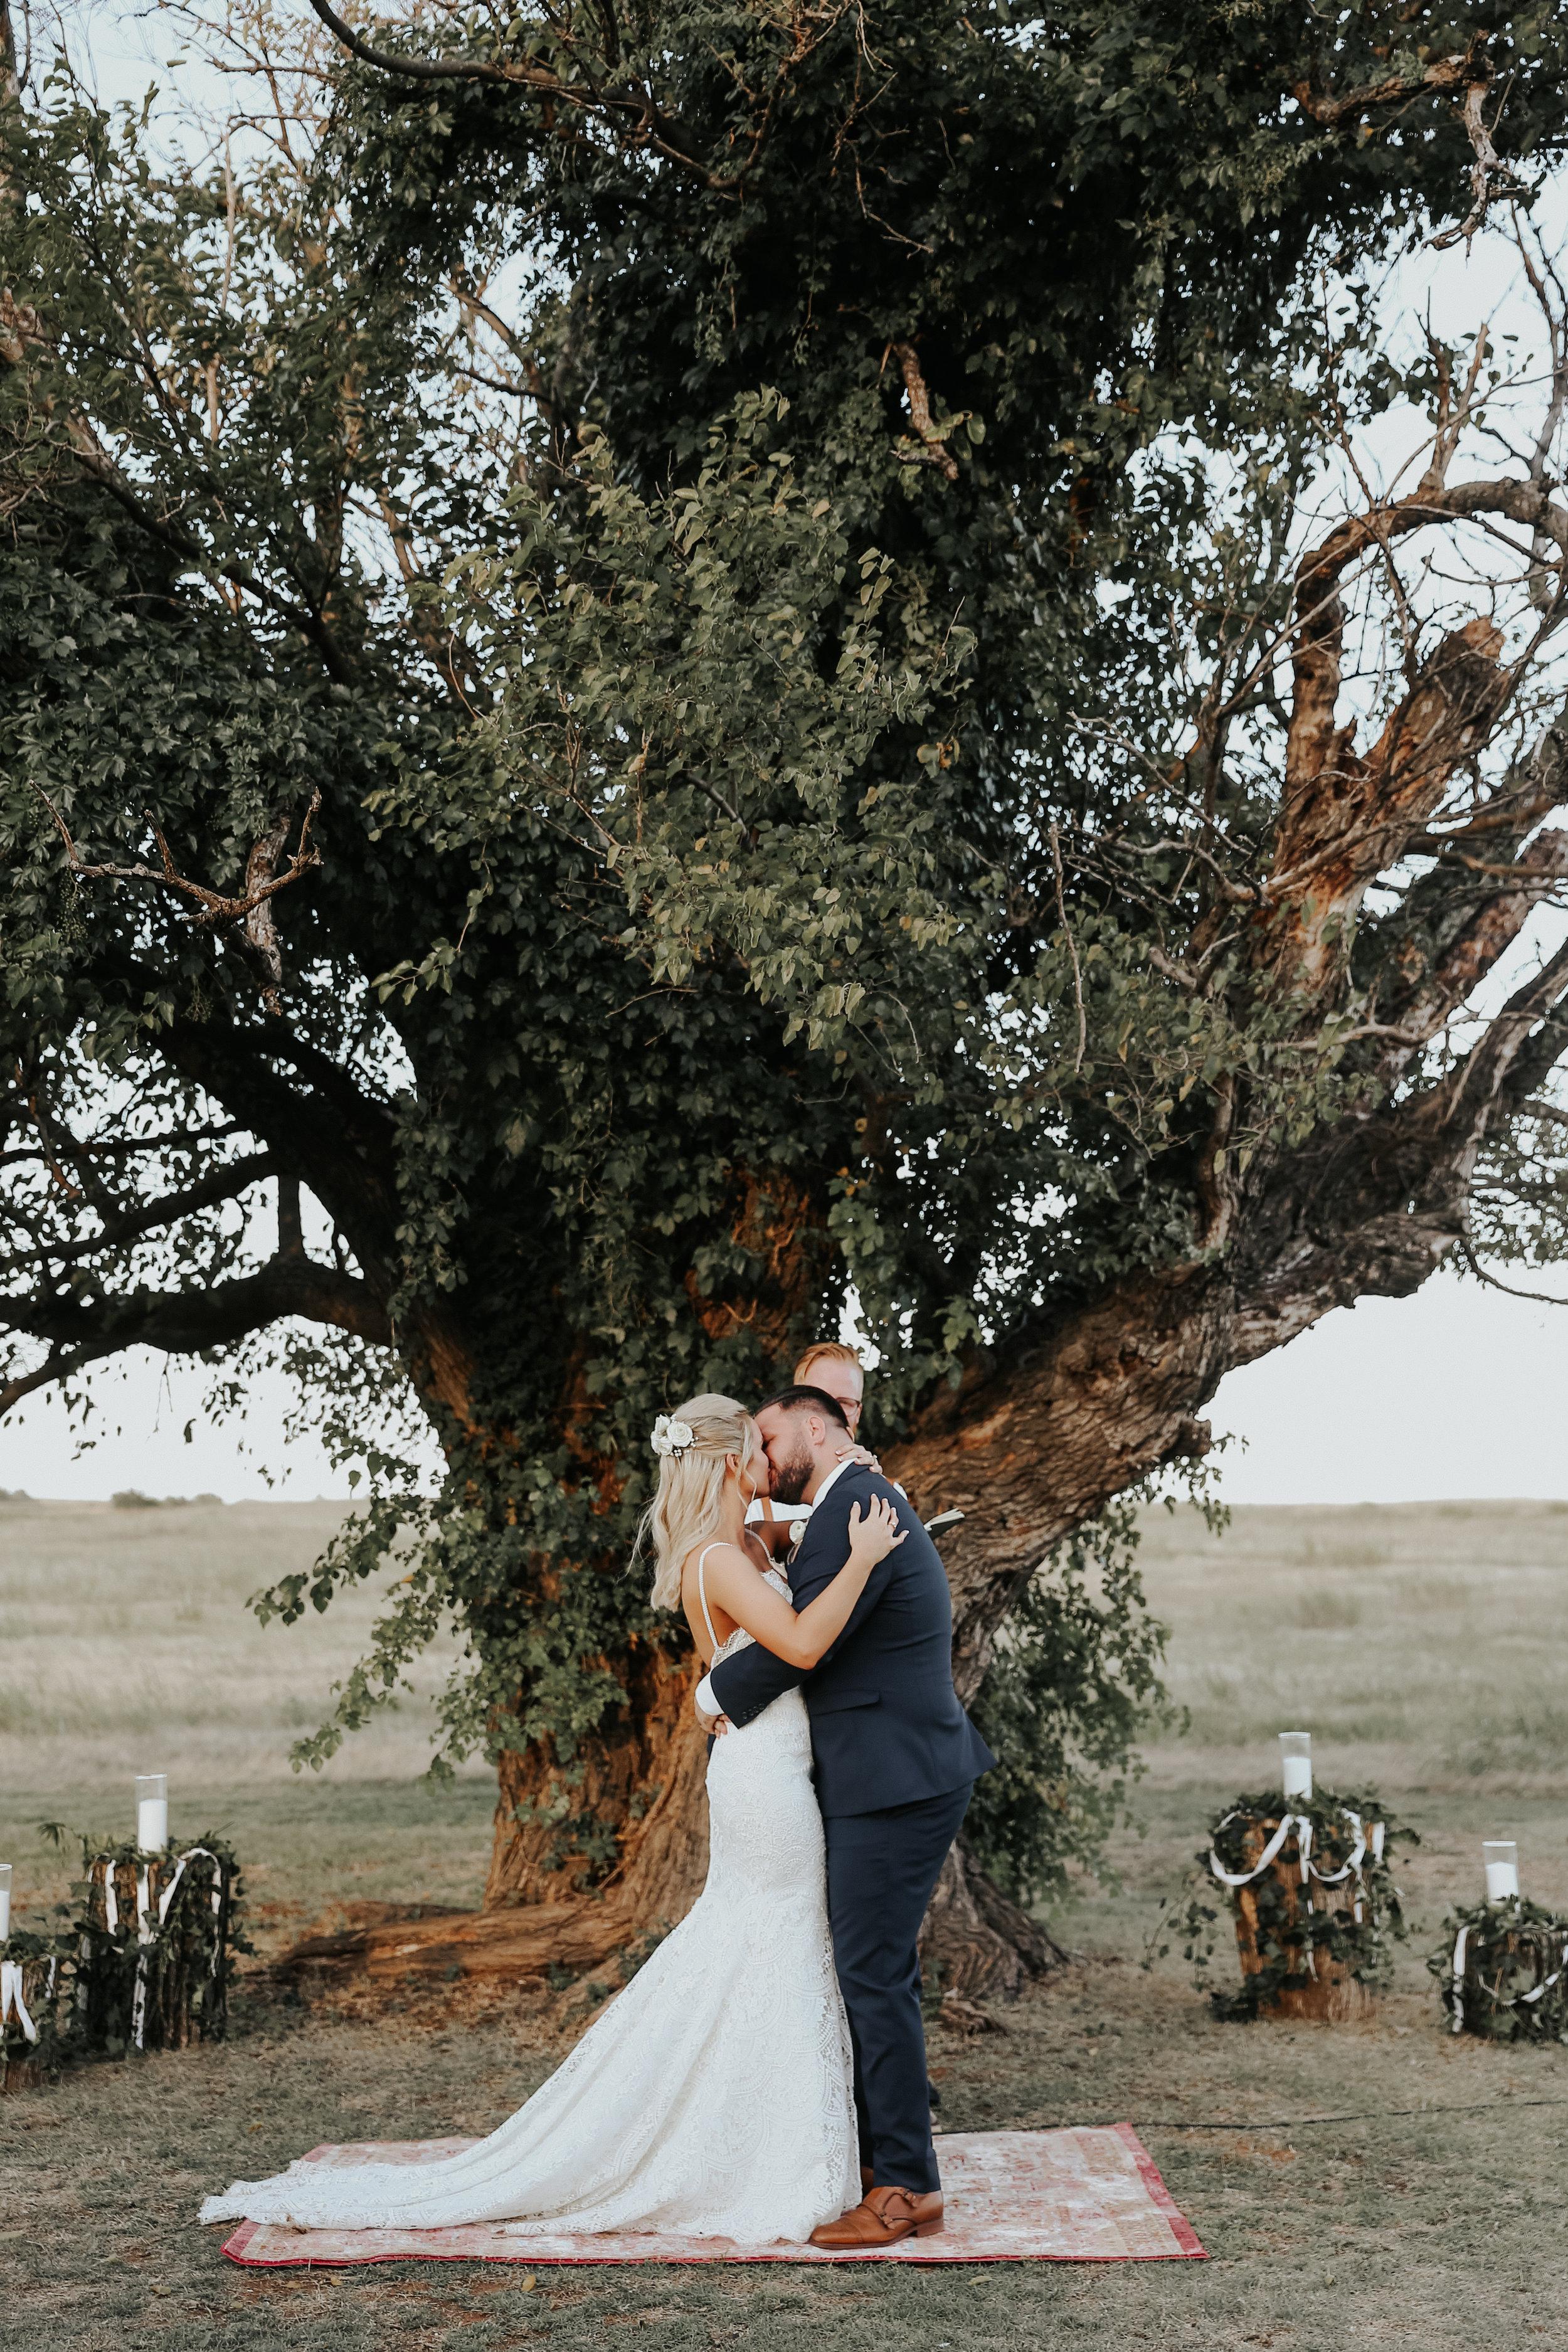 Backyard_Wedding_Oklahoma_MelissaMarshall_22.jpg